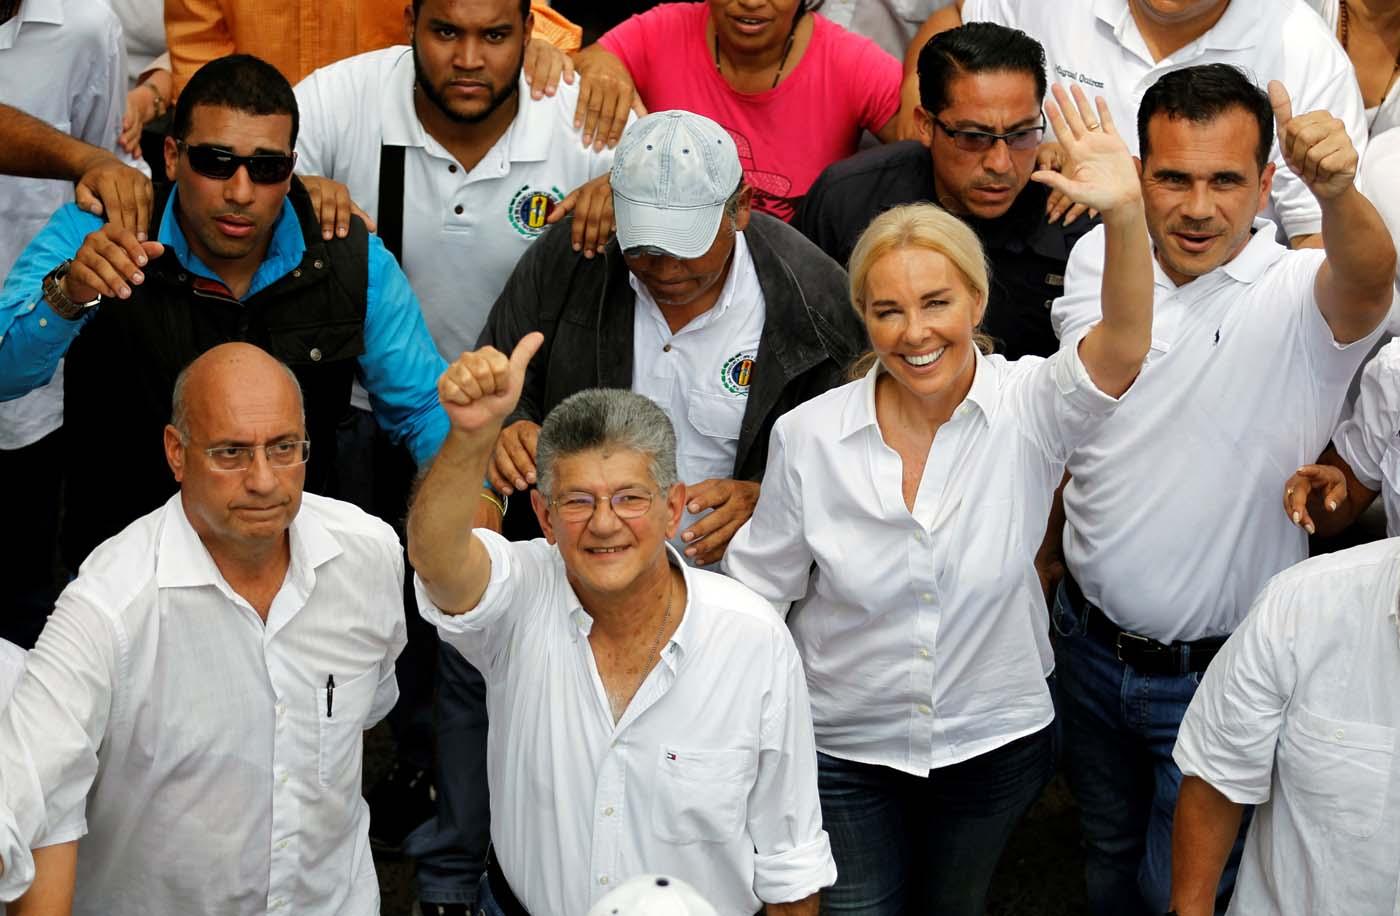 2016-10-26T174445Z_2124706263_S1AEUJFSQNAA_RTRMADP_3_VENEZUELA-POLITICS